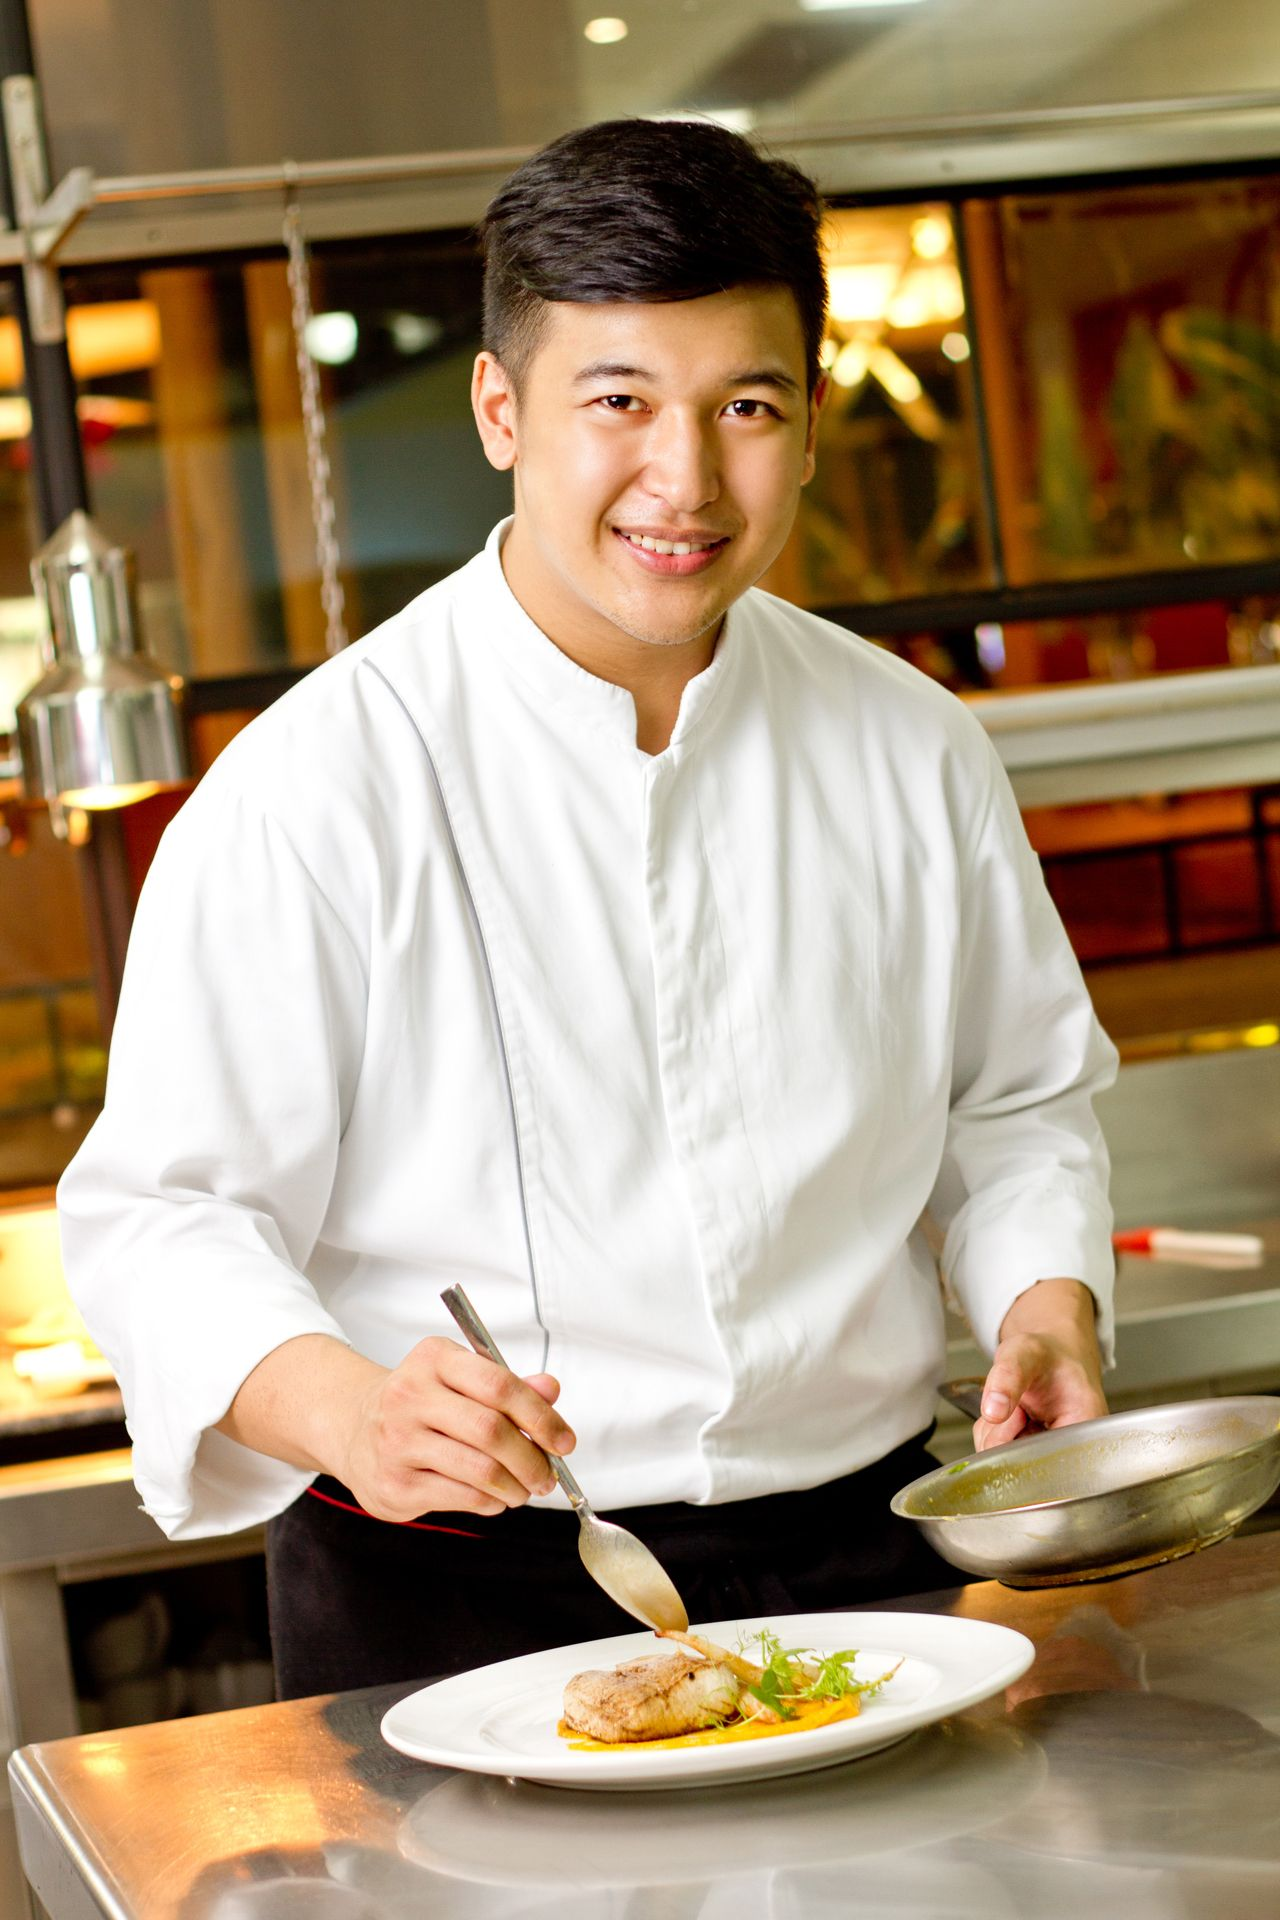 Meet The Chef: Justin Baradas